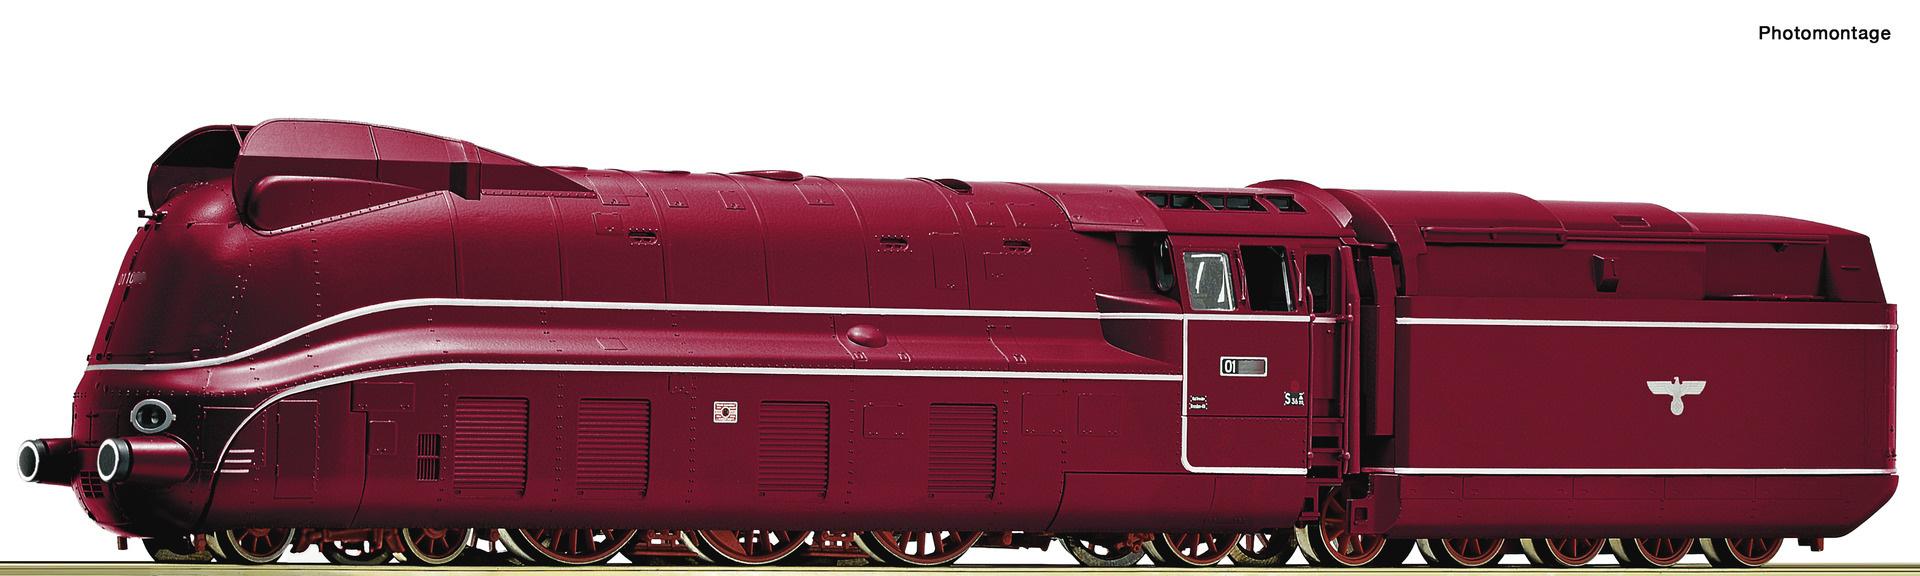 71205 Dampflok BR 01.10 DRB Snd.-1